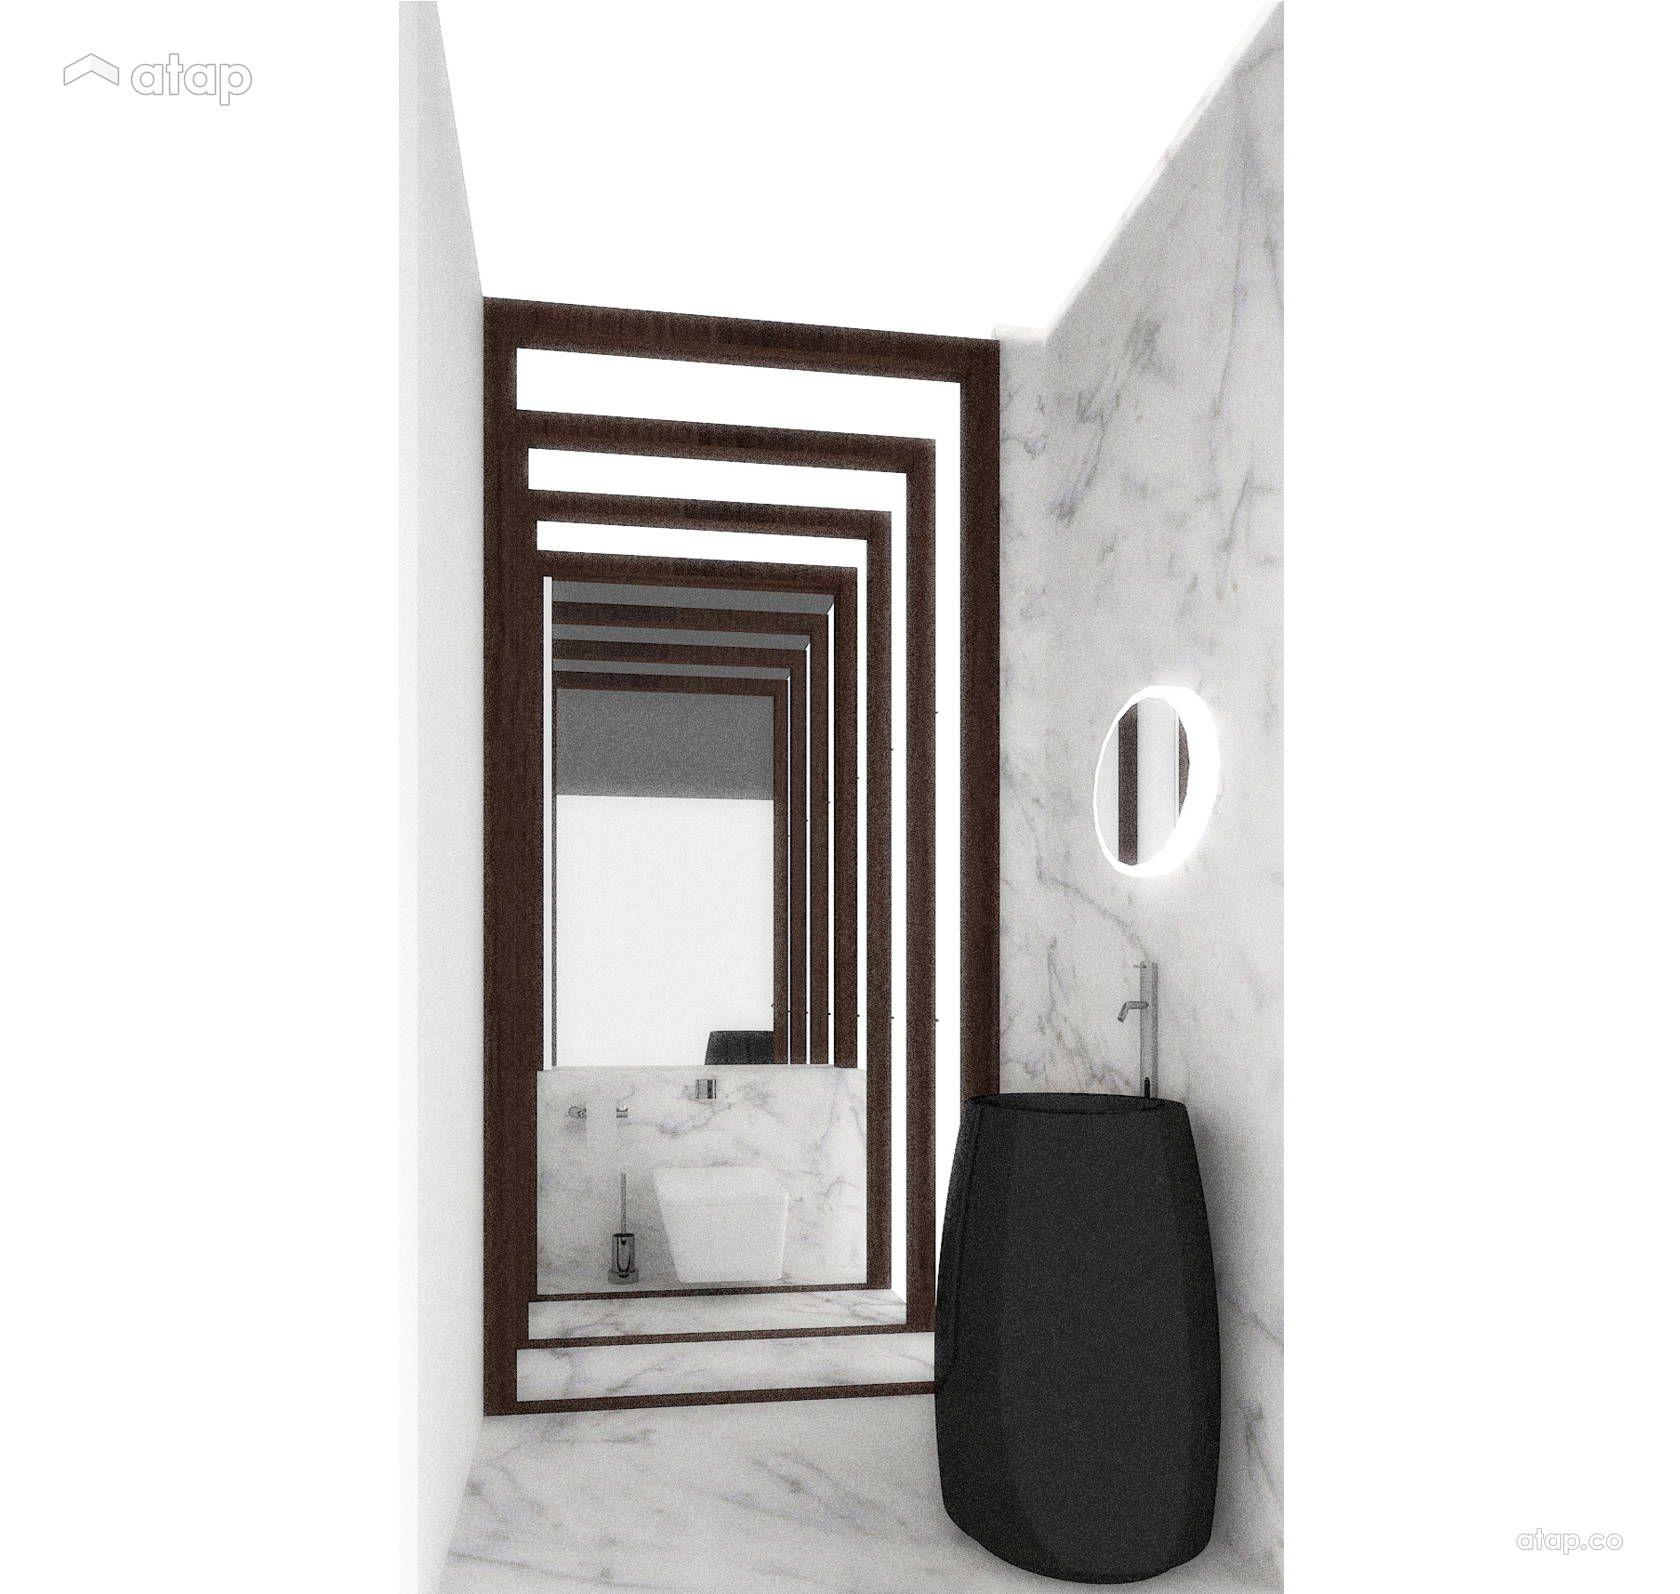 Minimalistic Bathroom Bungalow Design Ideas & Photos